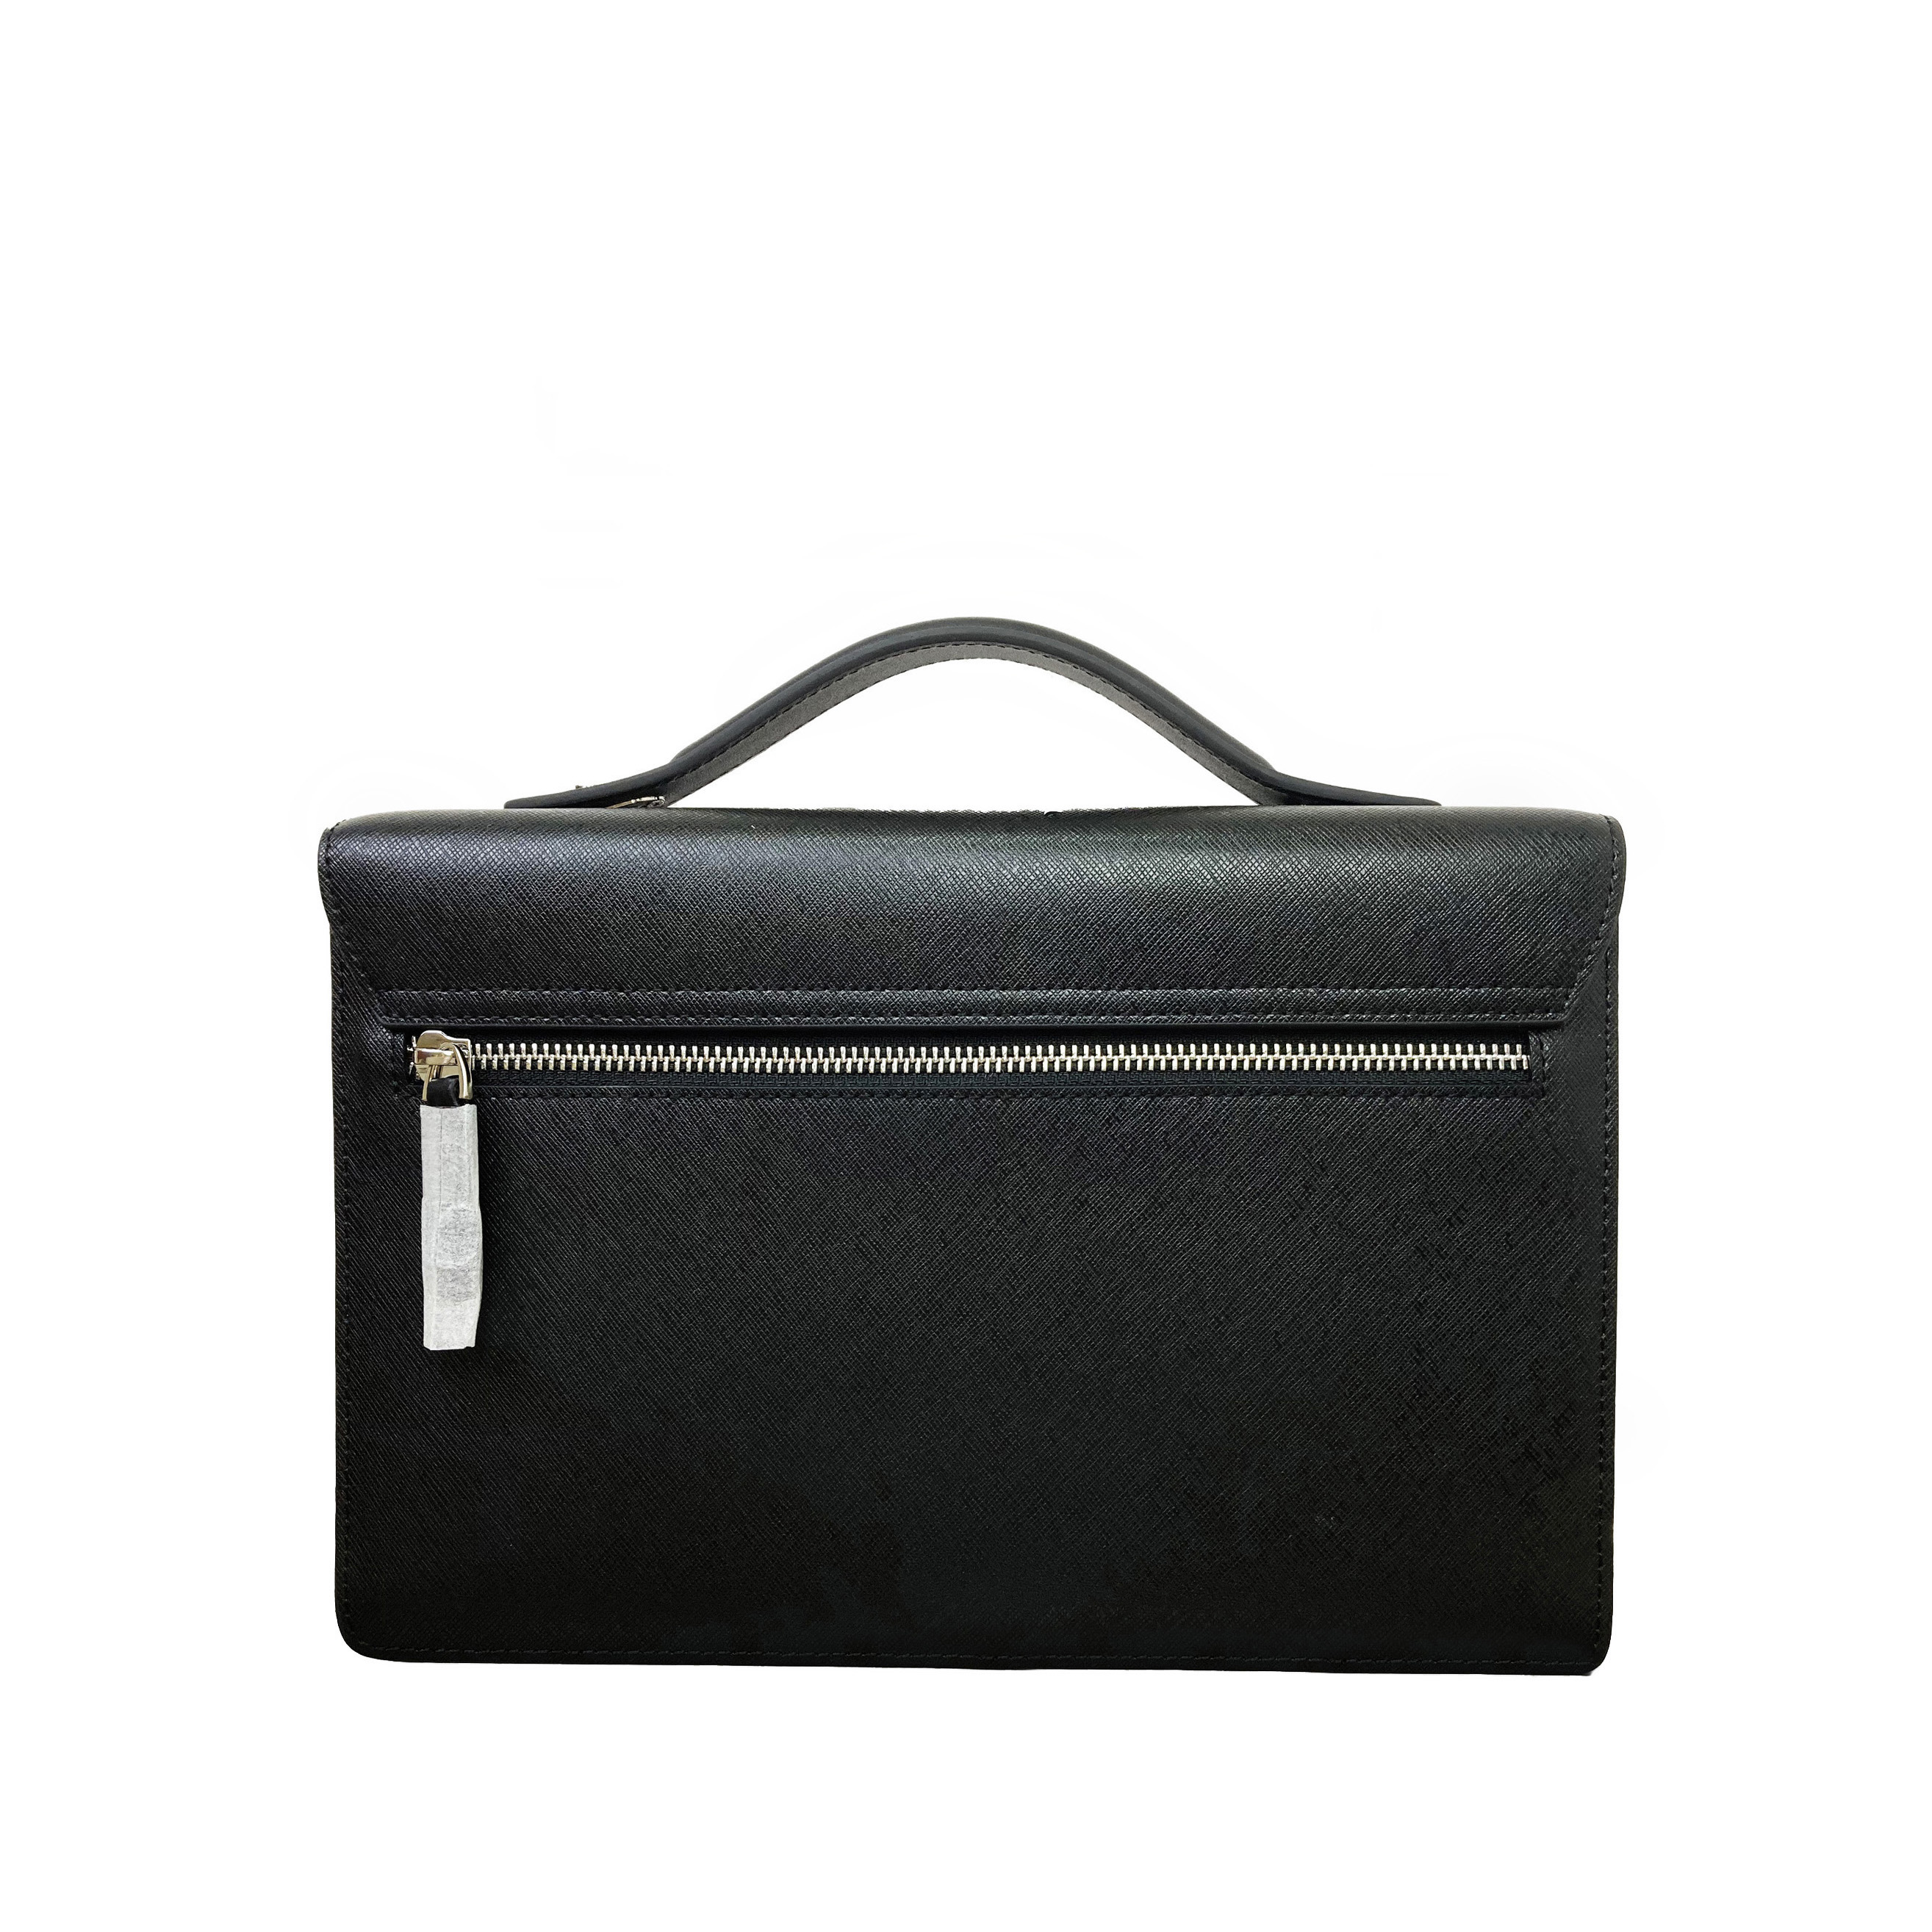 Homme Newington - Italian Saffiano Leather Handbag